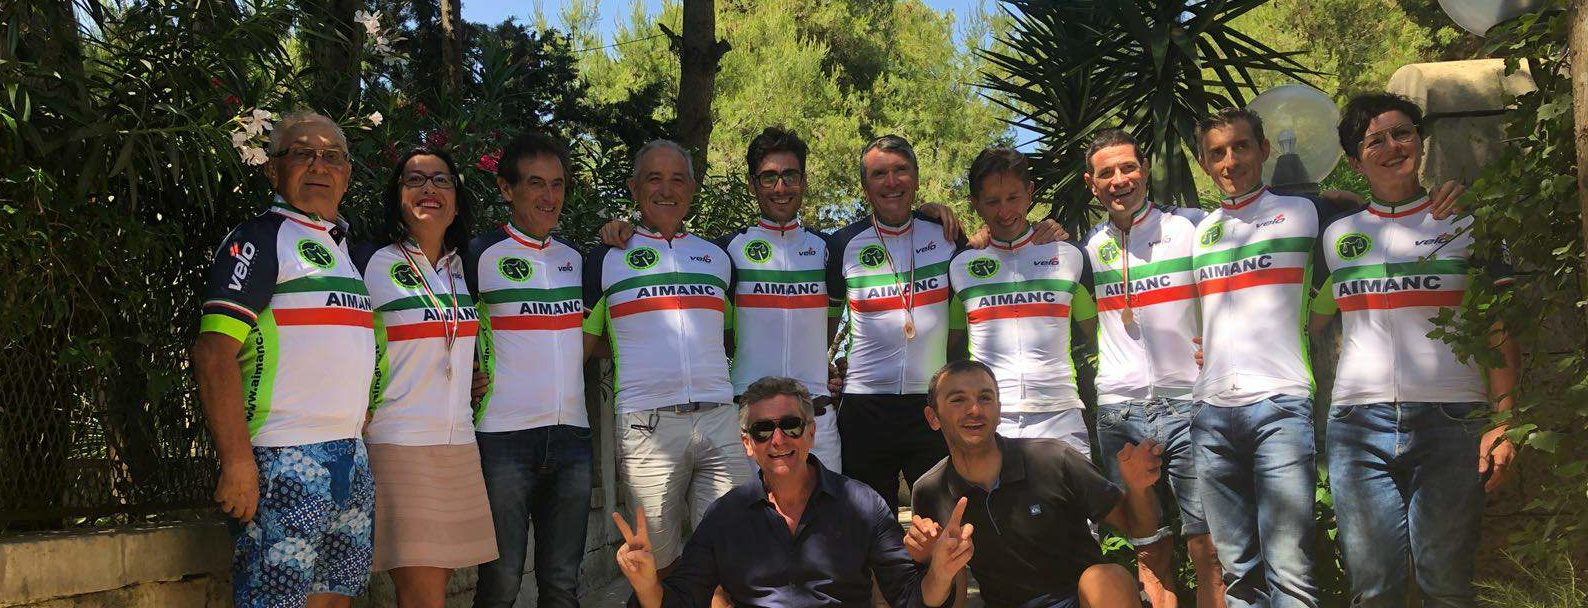 CAMPIONATI ITALIANI FORENSI – OTRANTO 2018